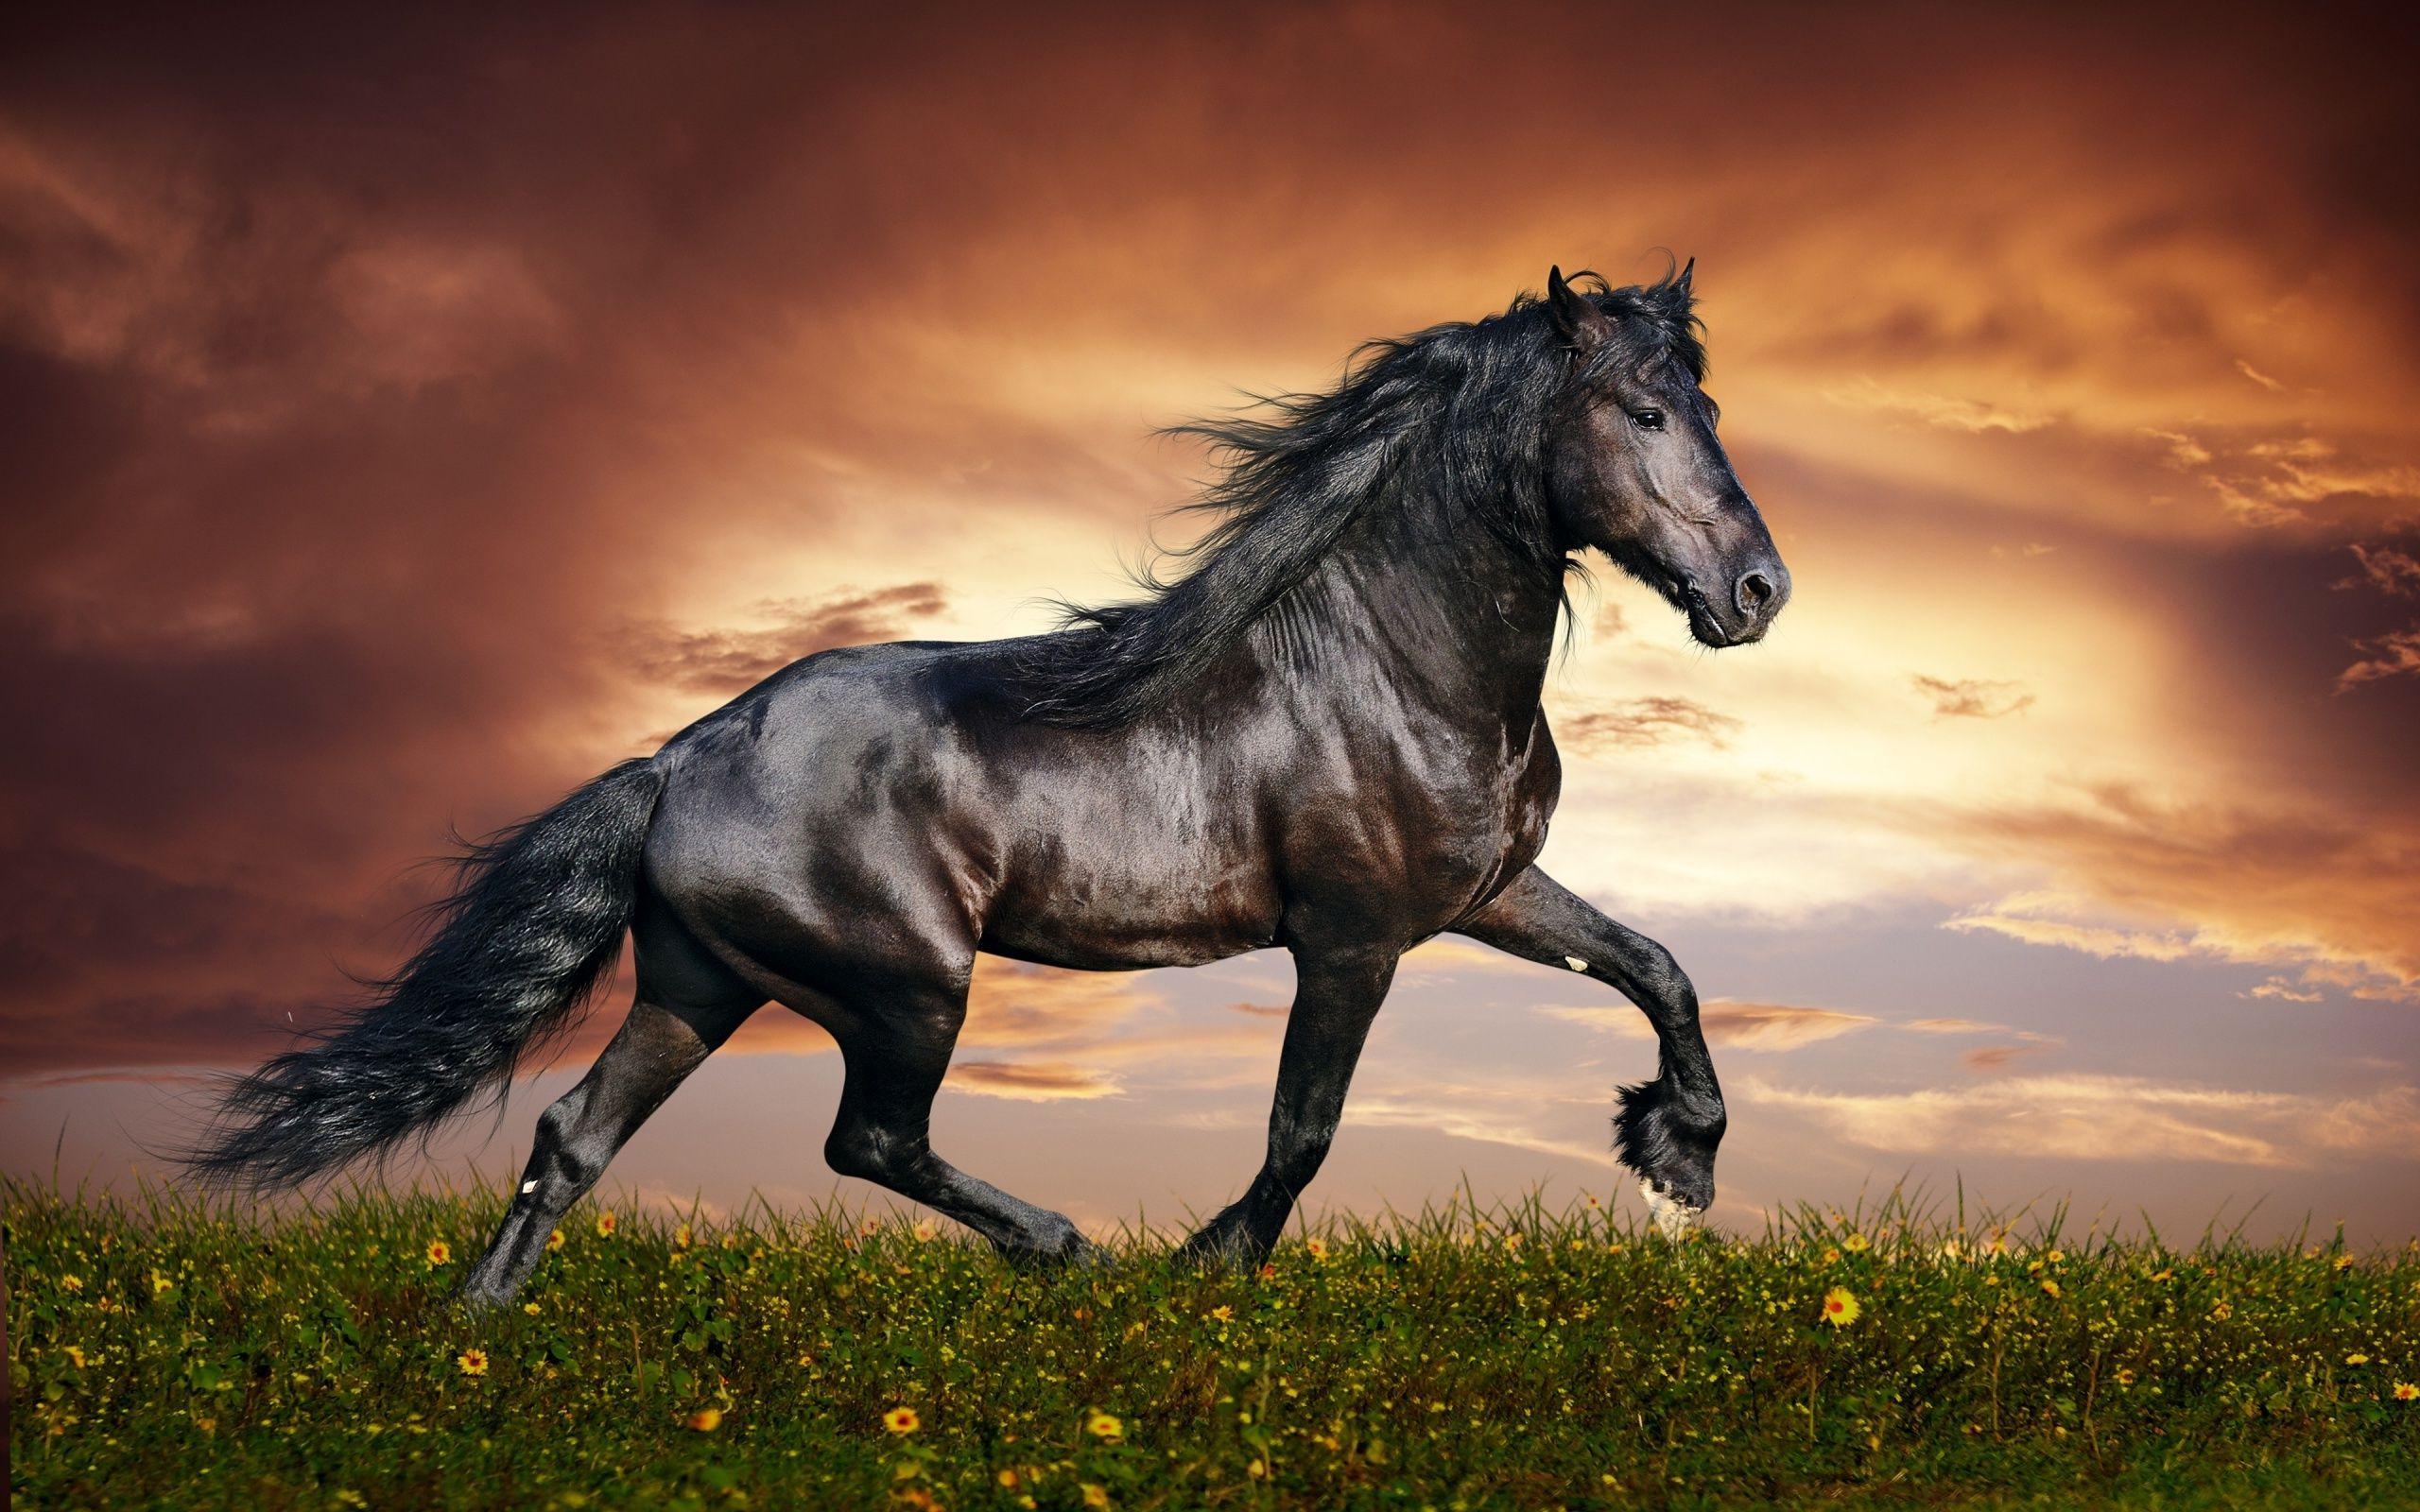 Free HD Horse Backgrounds Desktop Wallpapers Horse